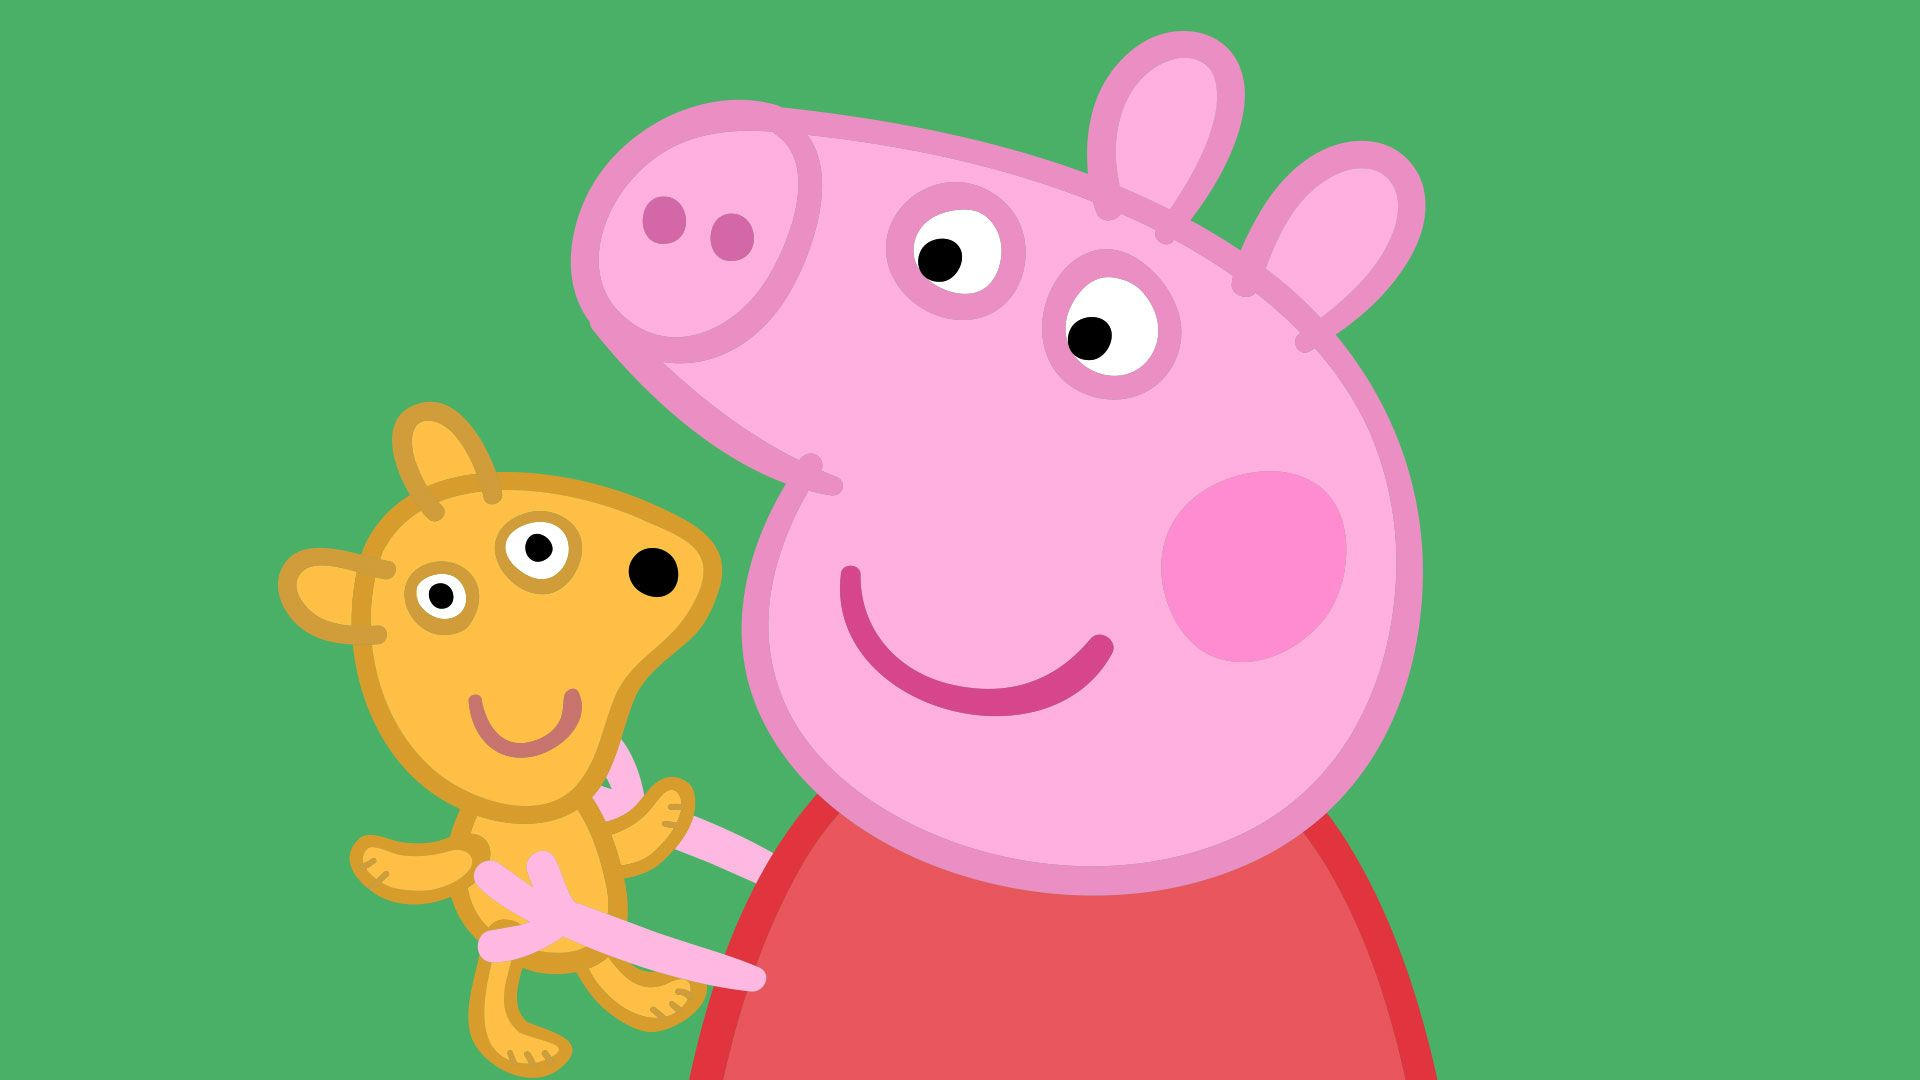 Peppa Pig Download Wallpaper